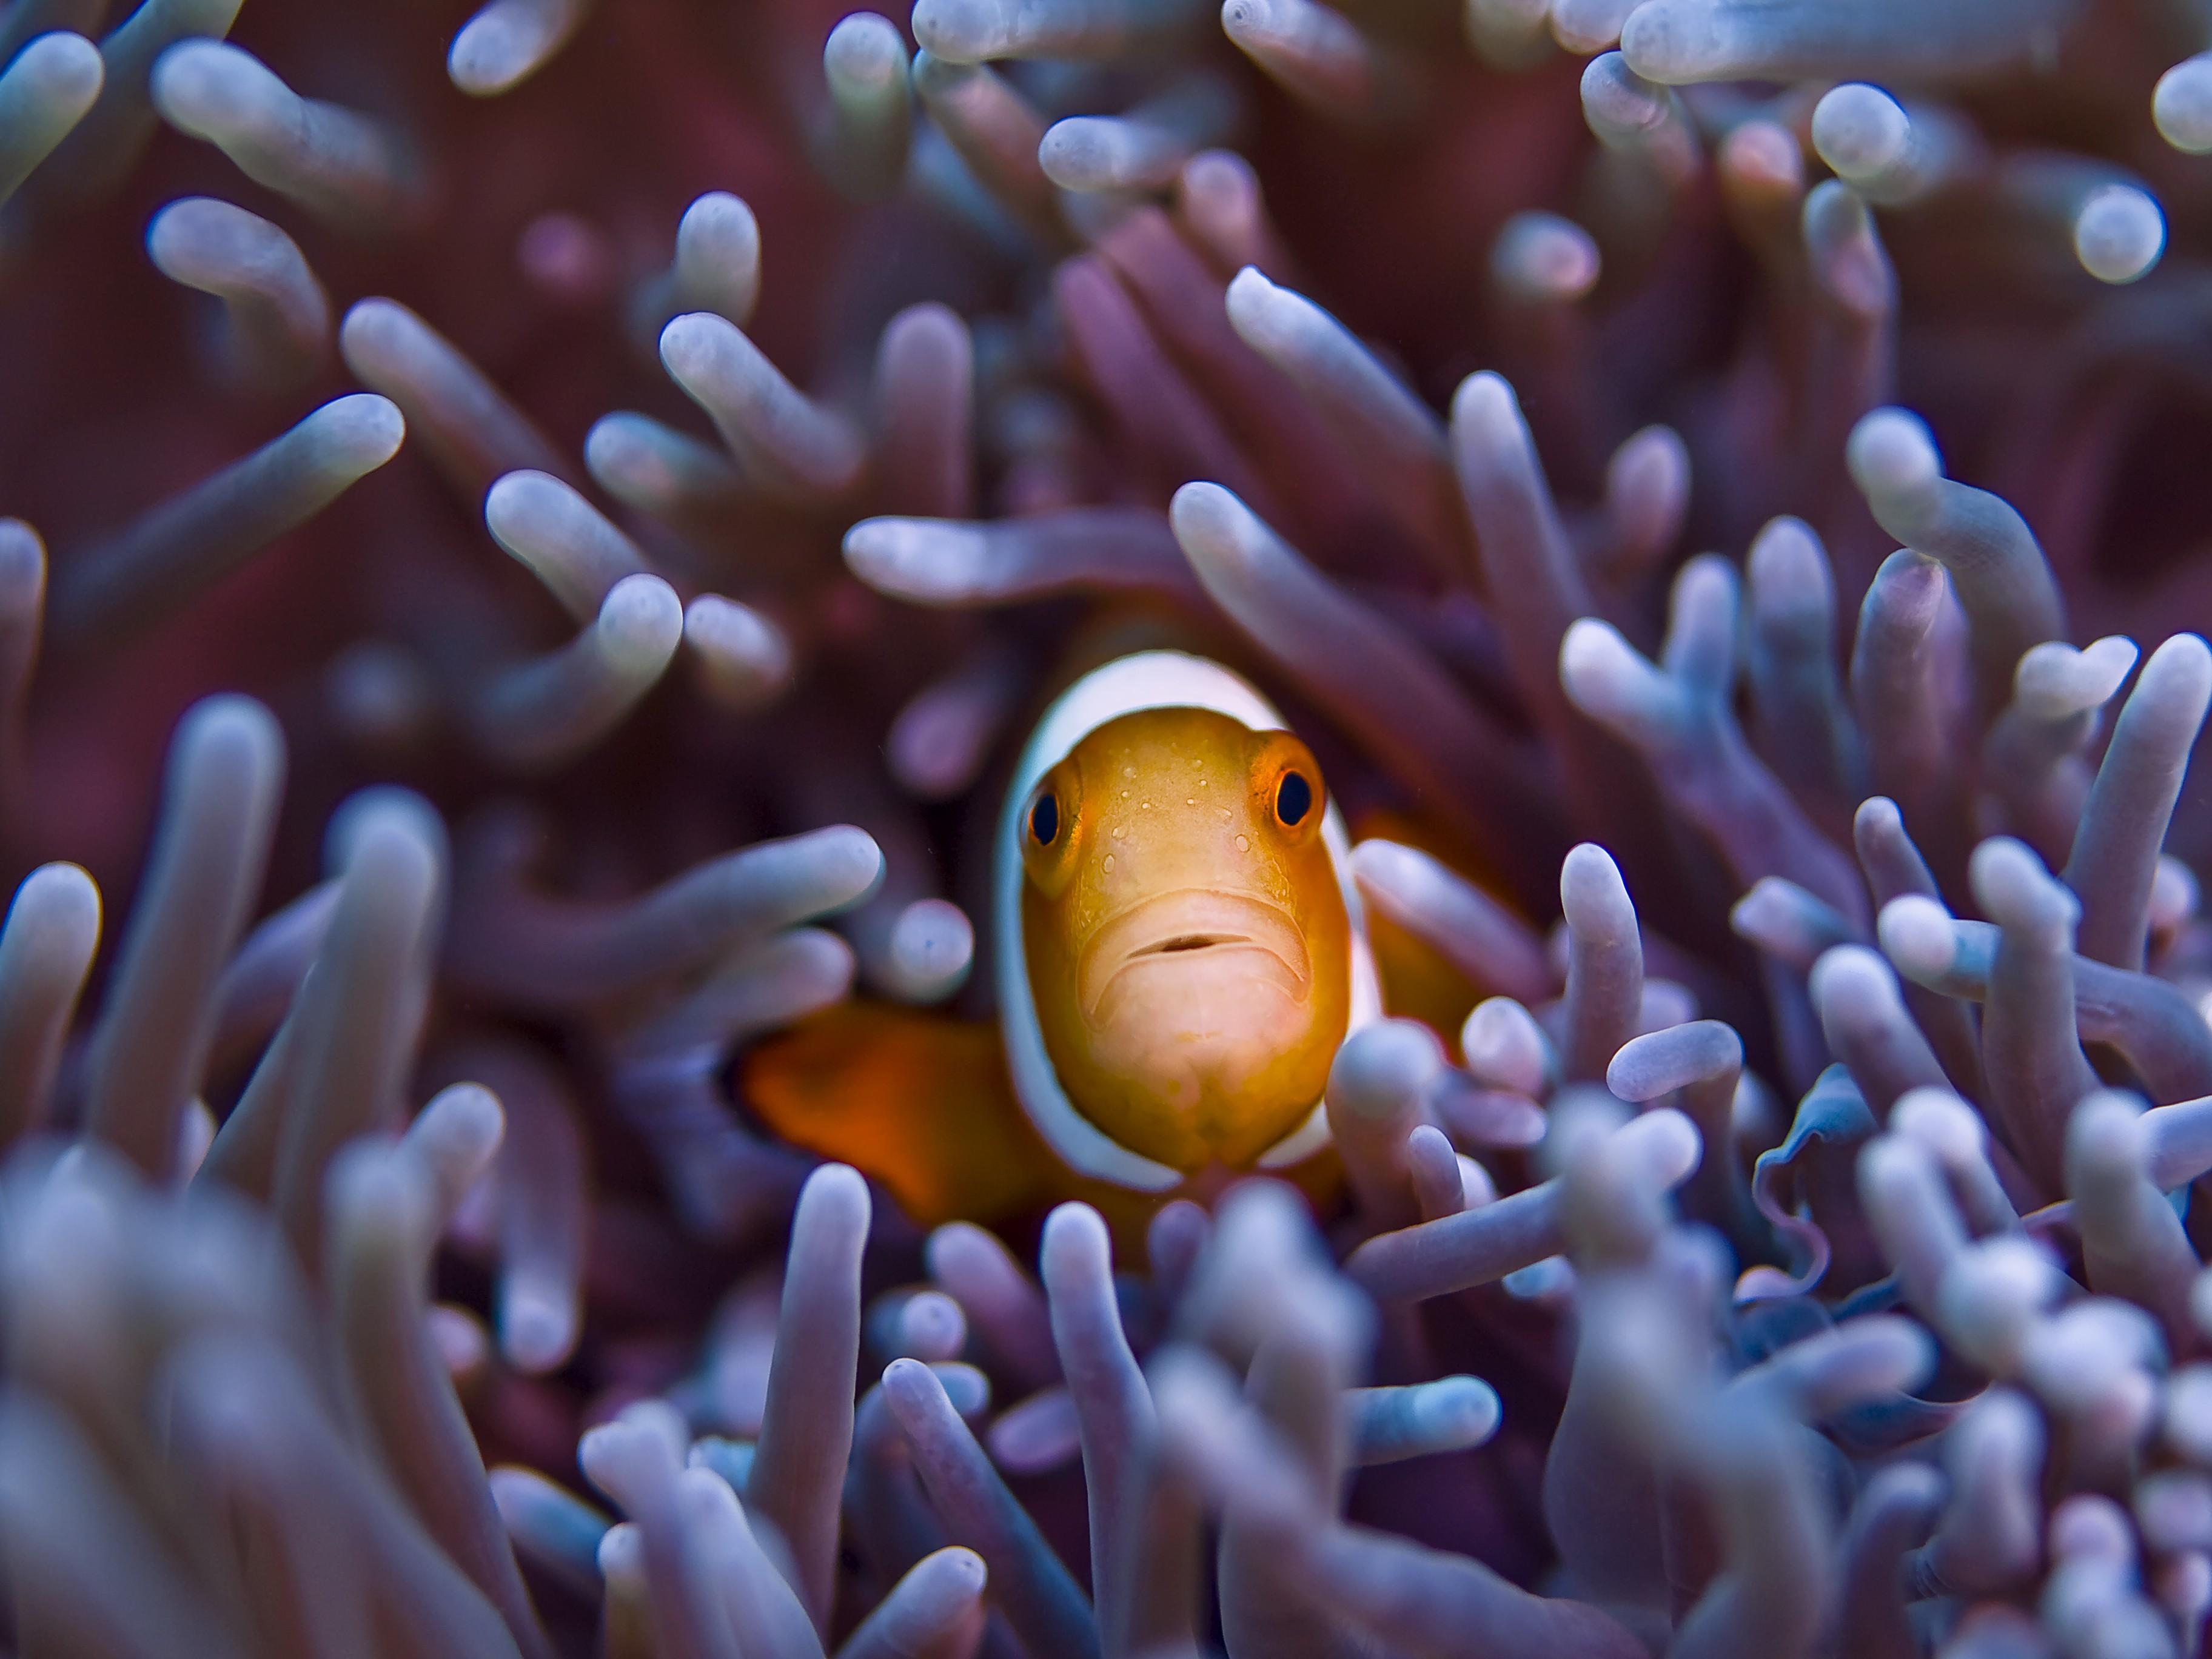 wallpaper clownfish, 5k, 4k wallpaper, gili, island, bali, indian